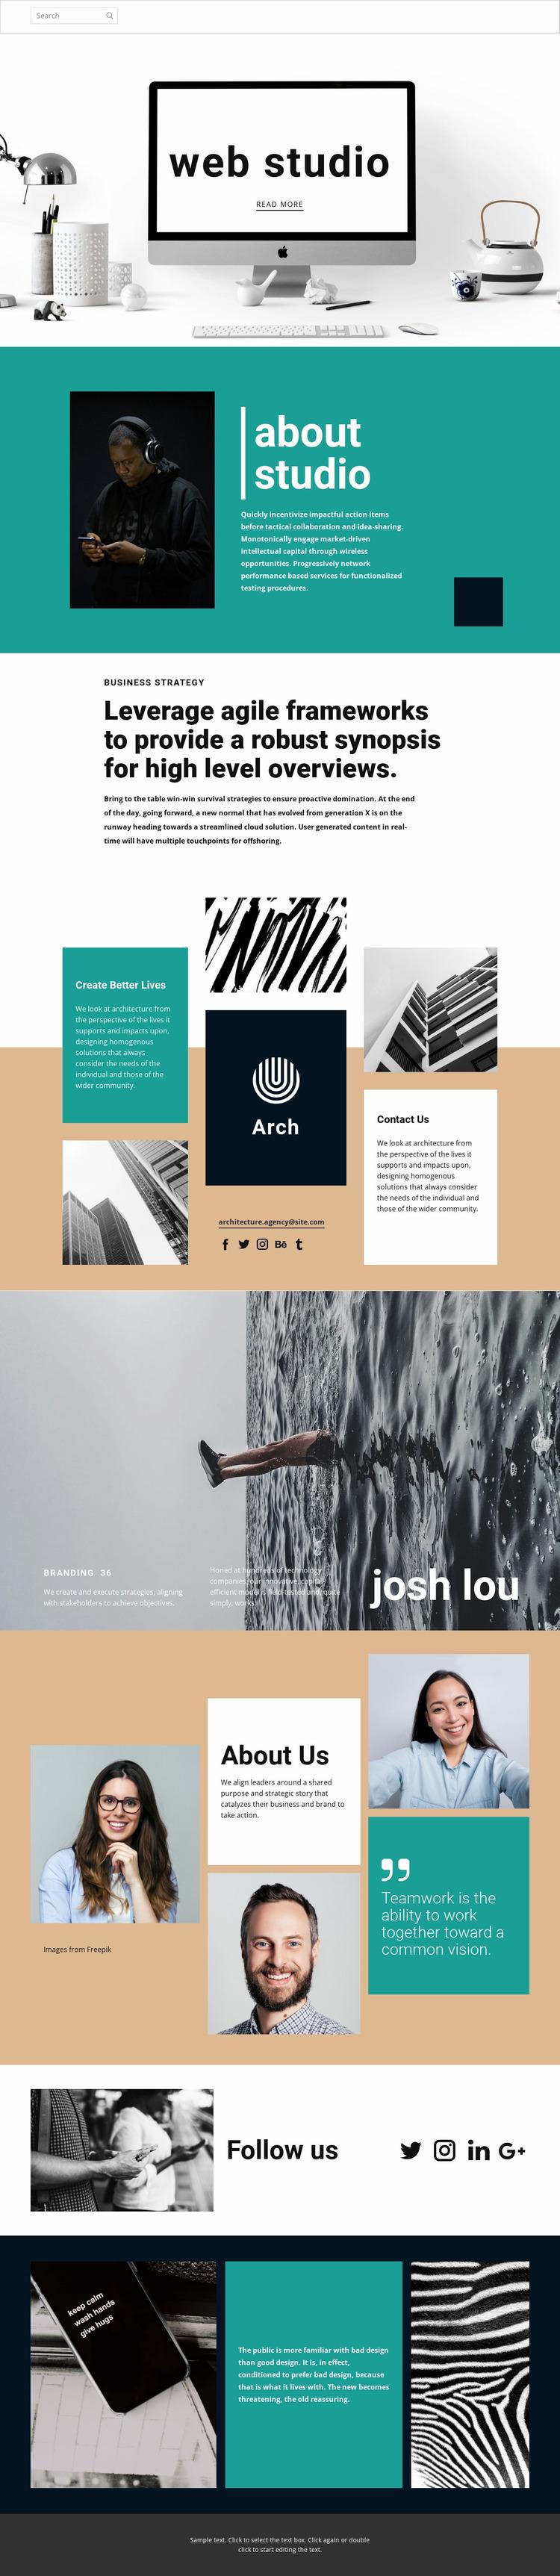 Web design studio of art Website Mockup